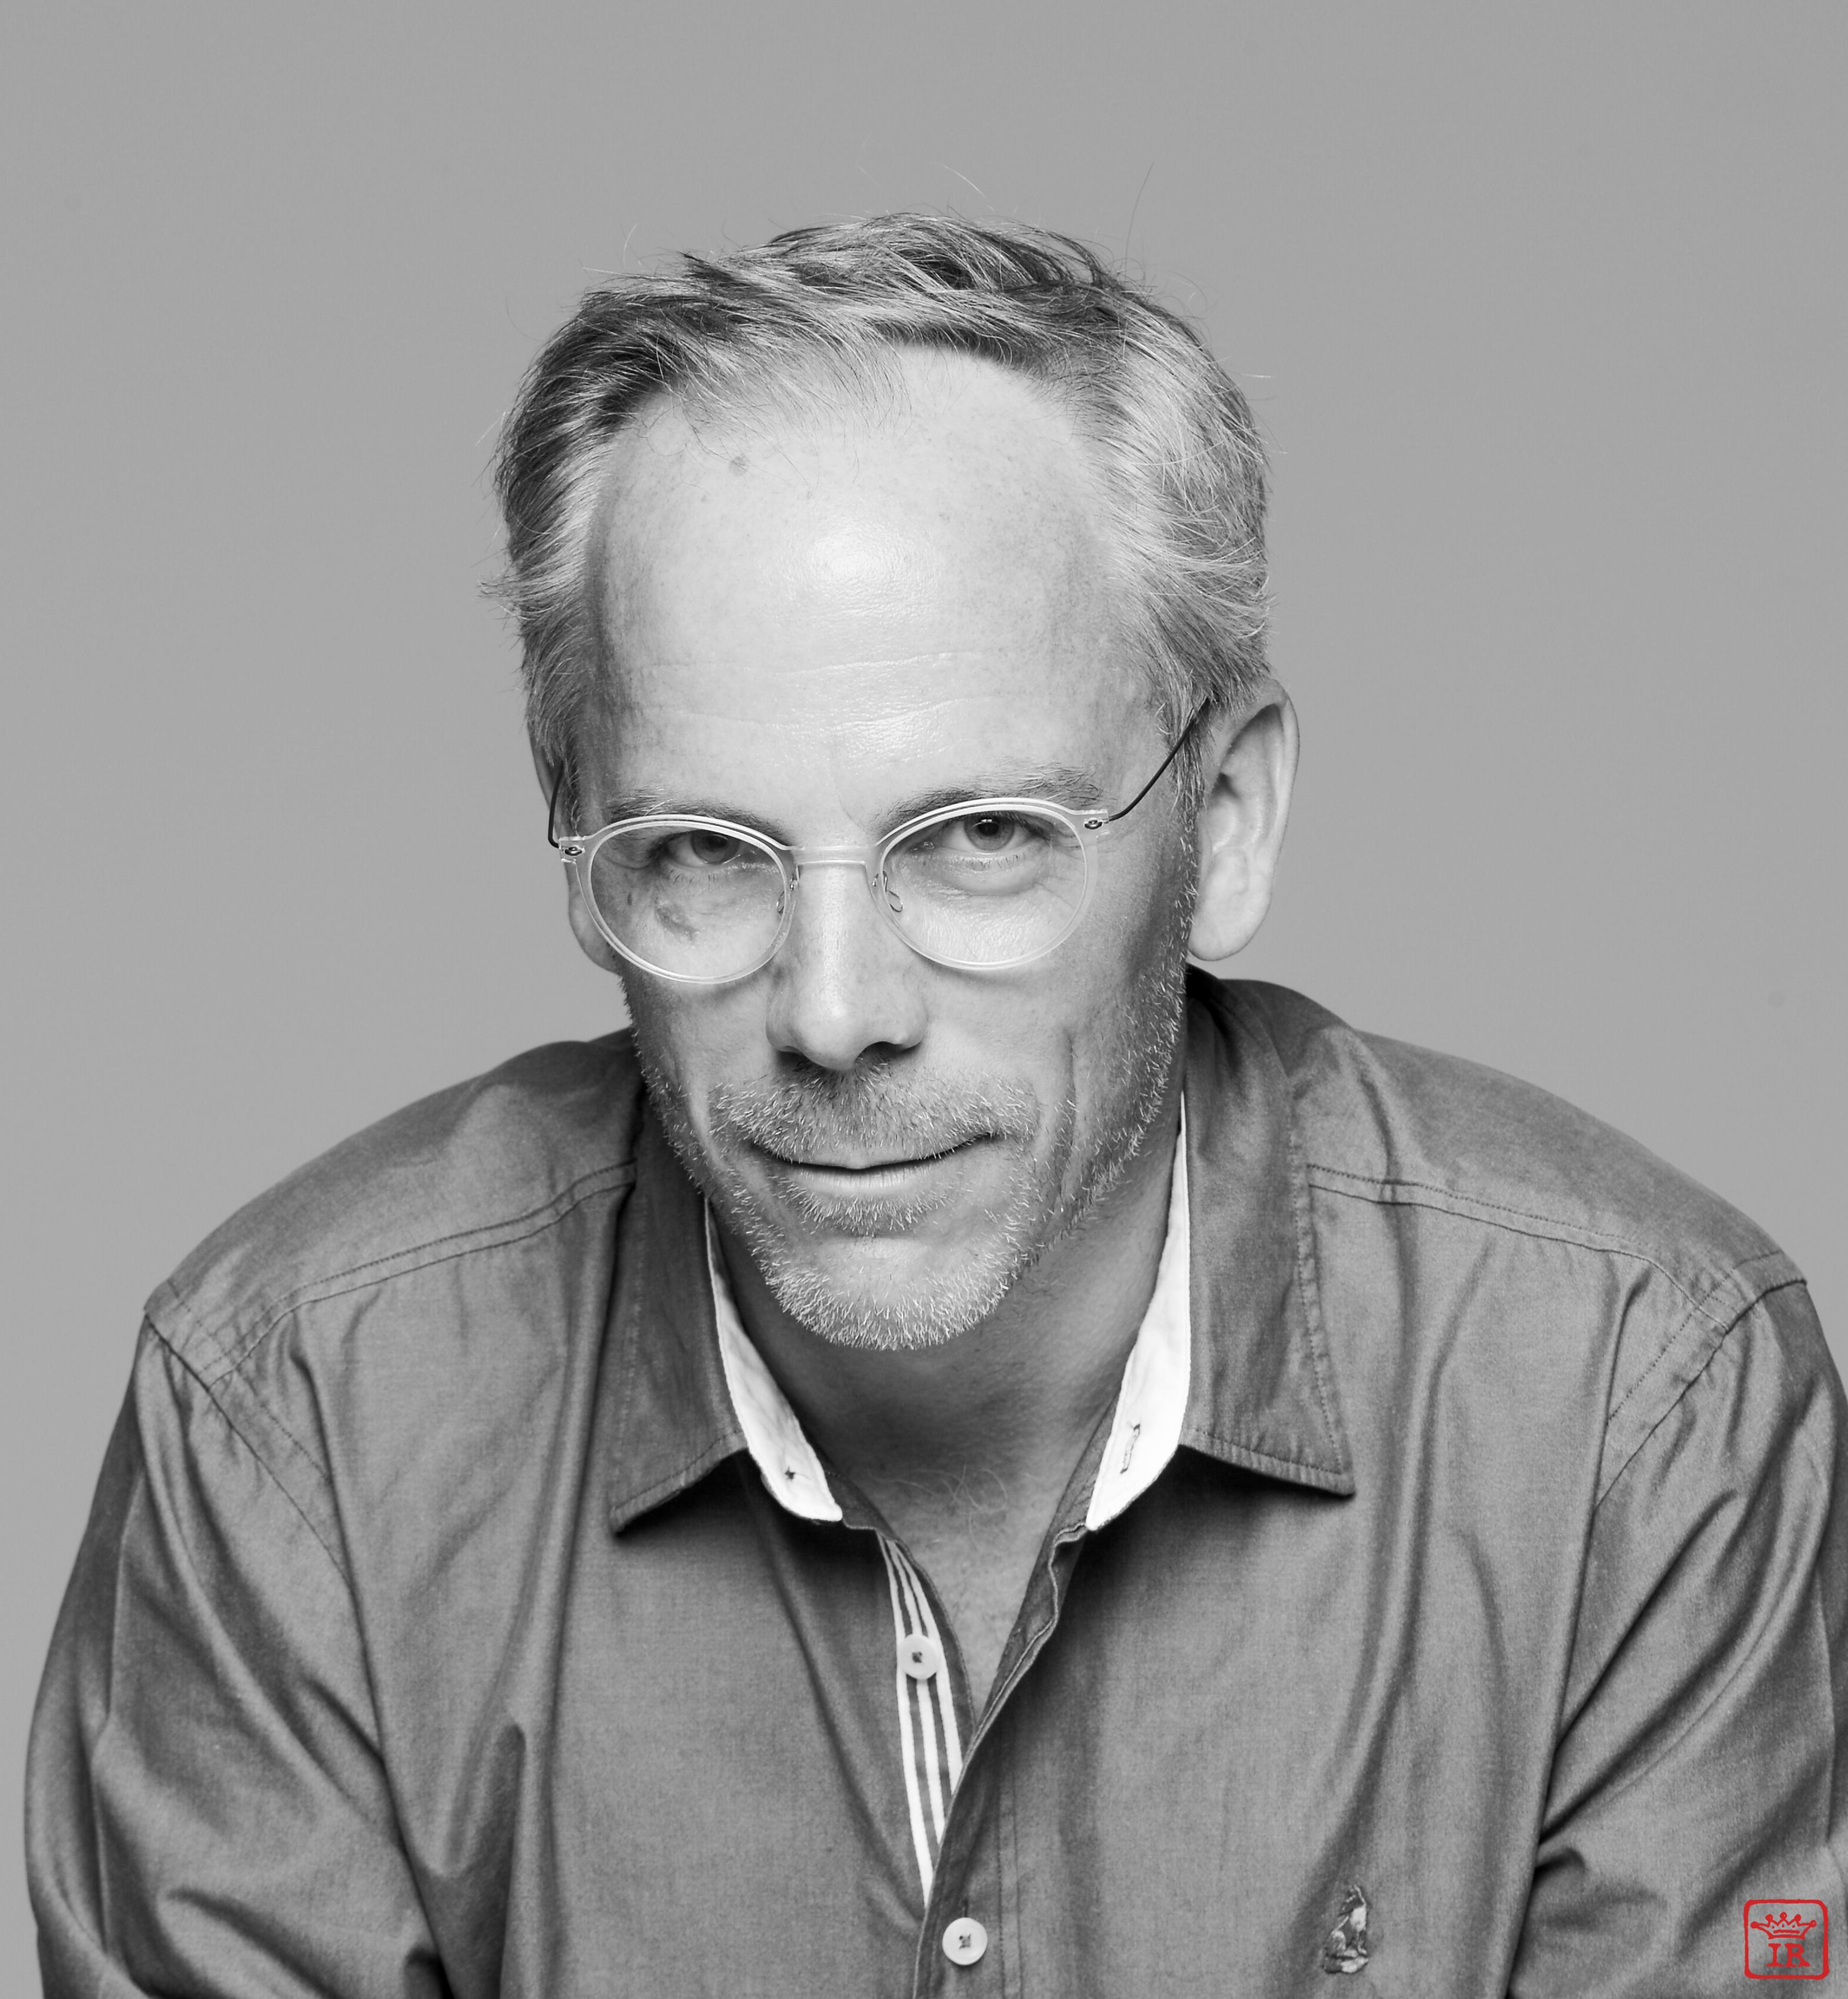 Remi de Fouchier, vice president of Marketing, Gemalto